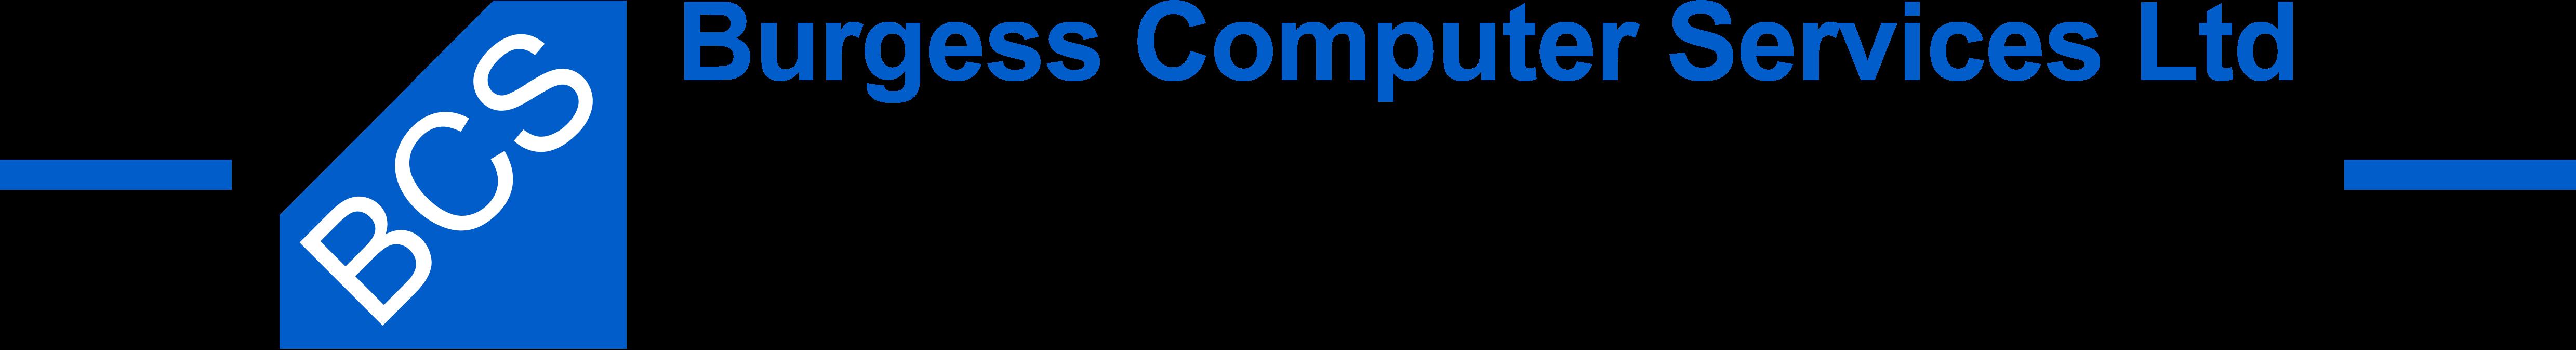 Burgess Computer Services Ltd